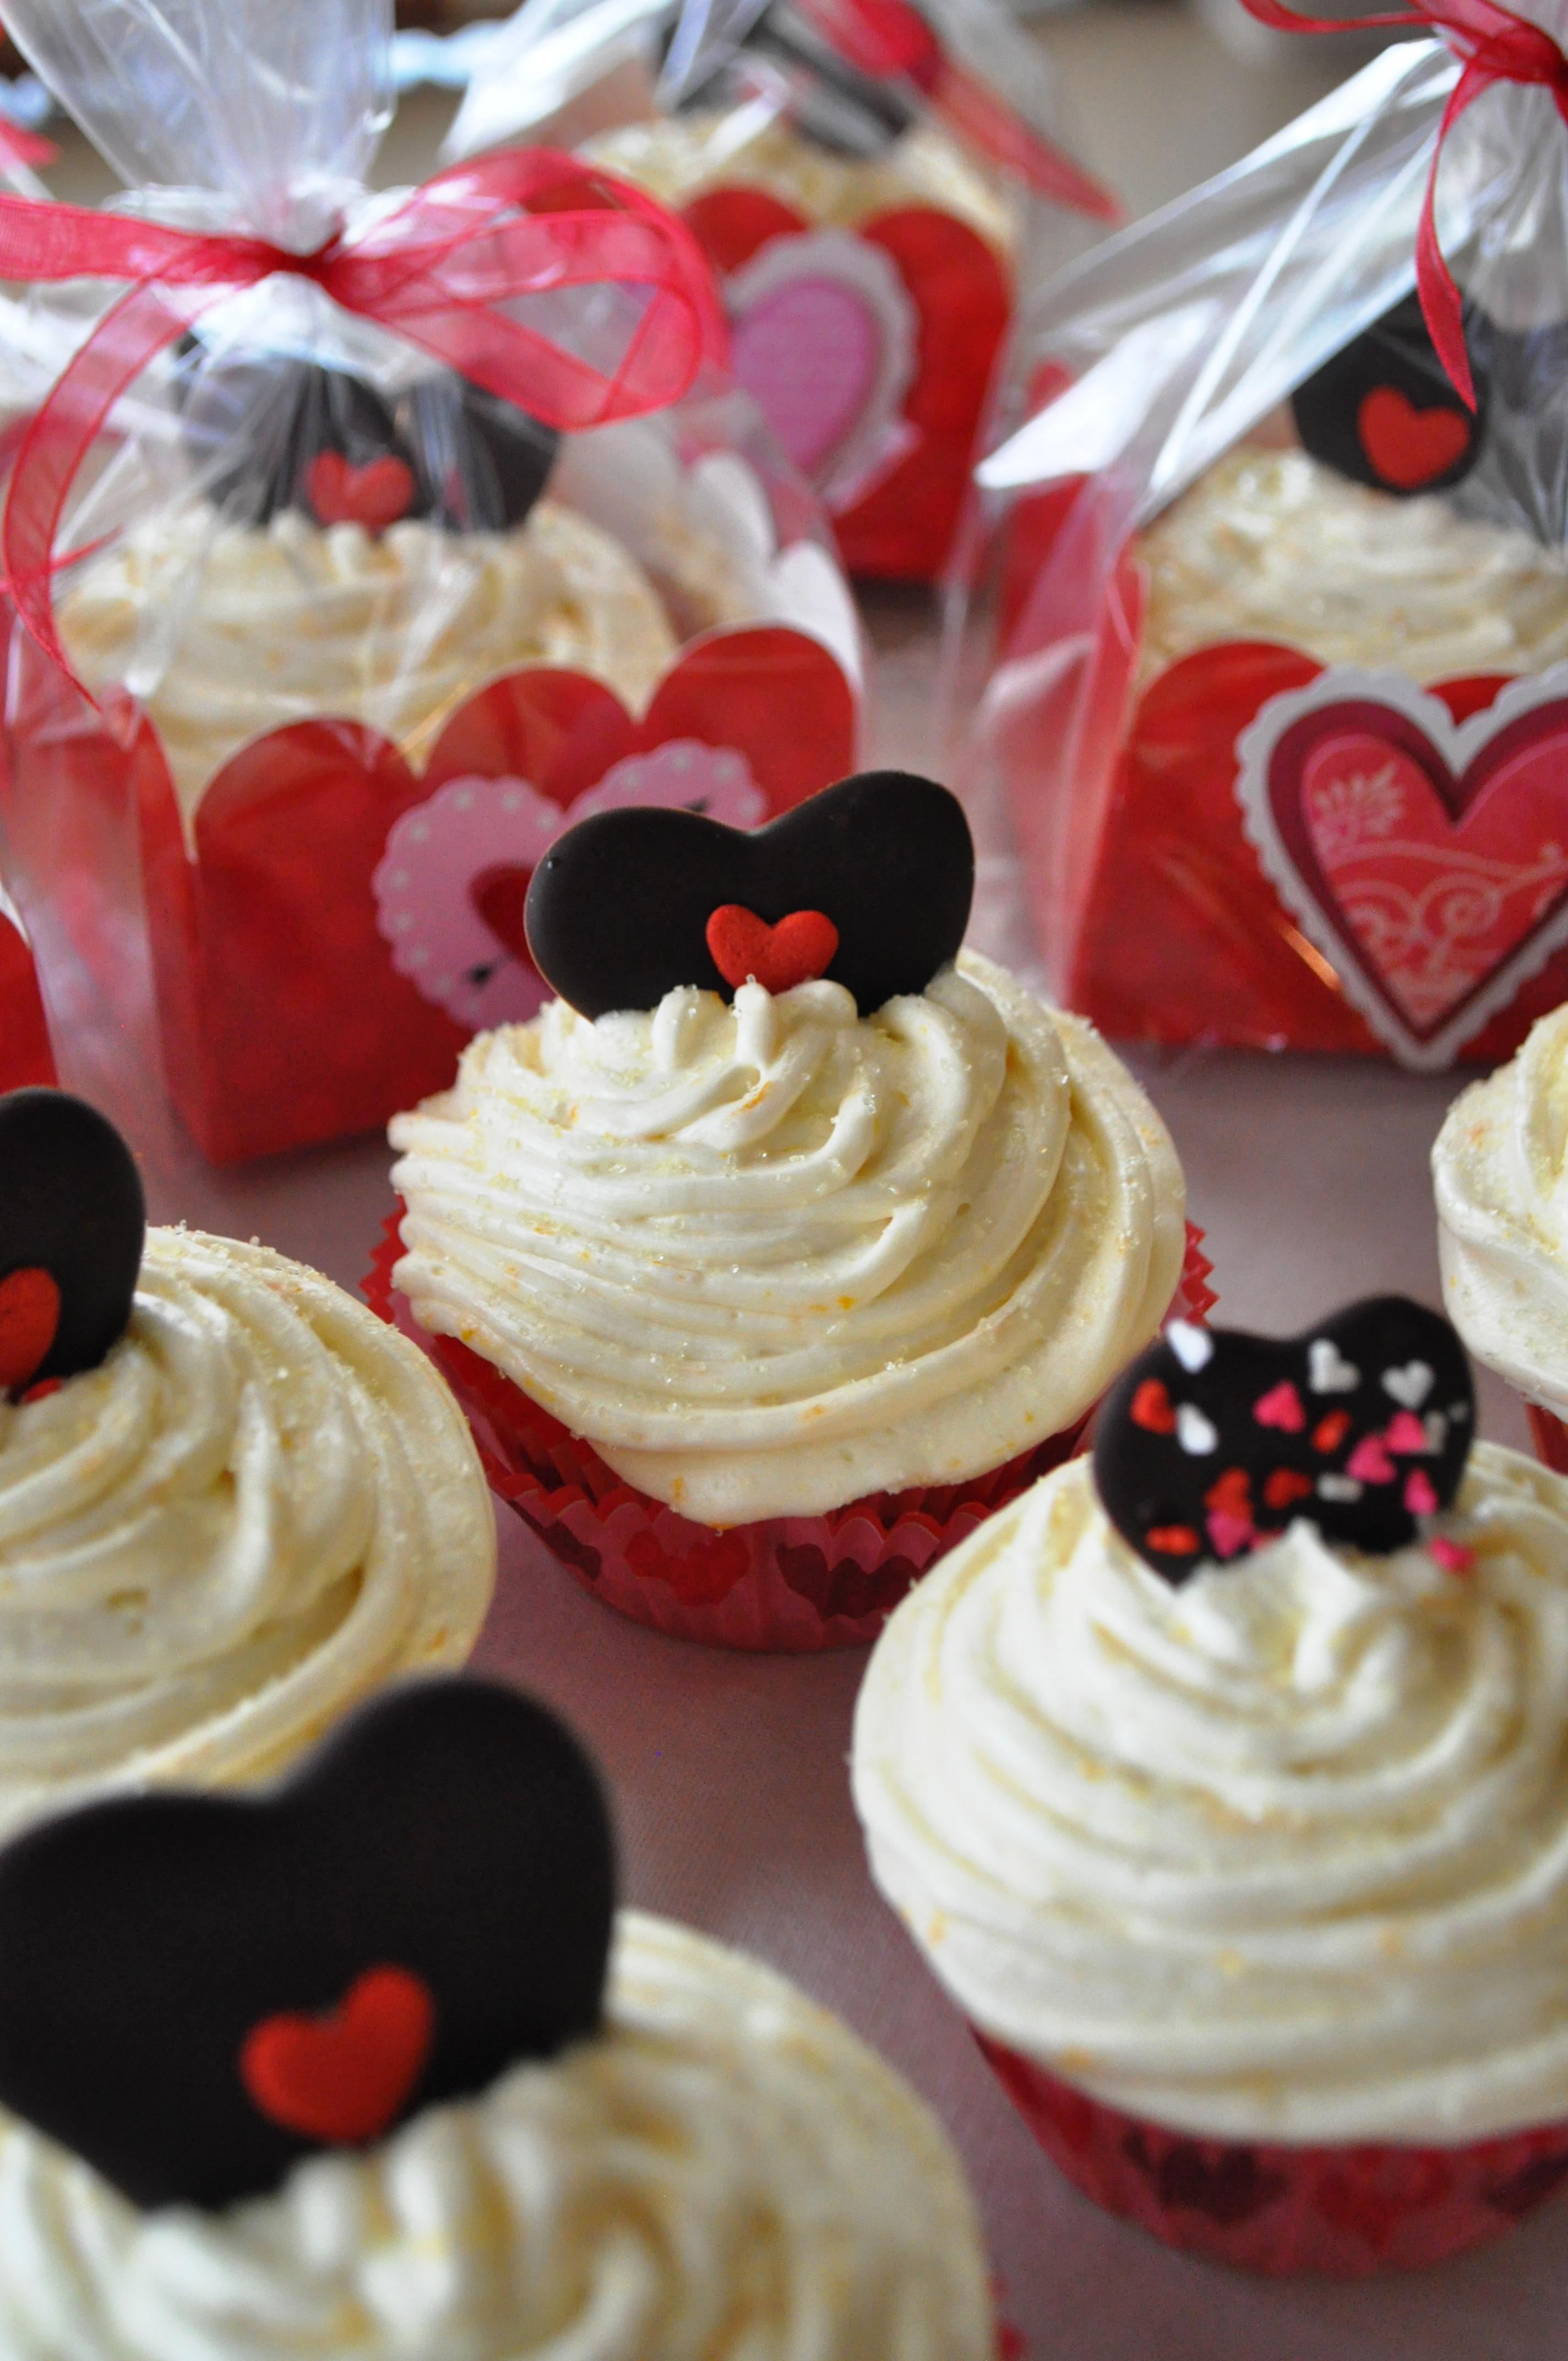 Buttercream On Cupcakes